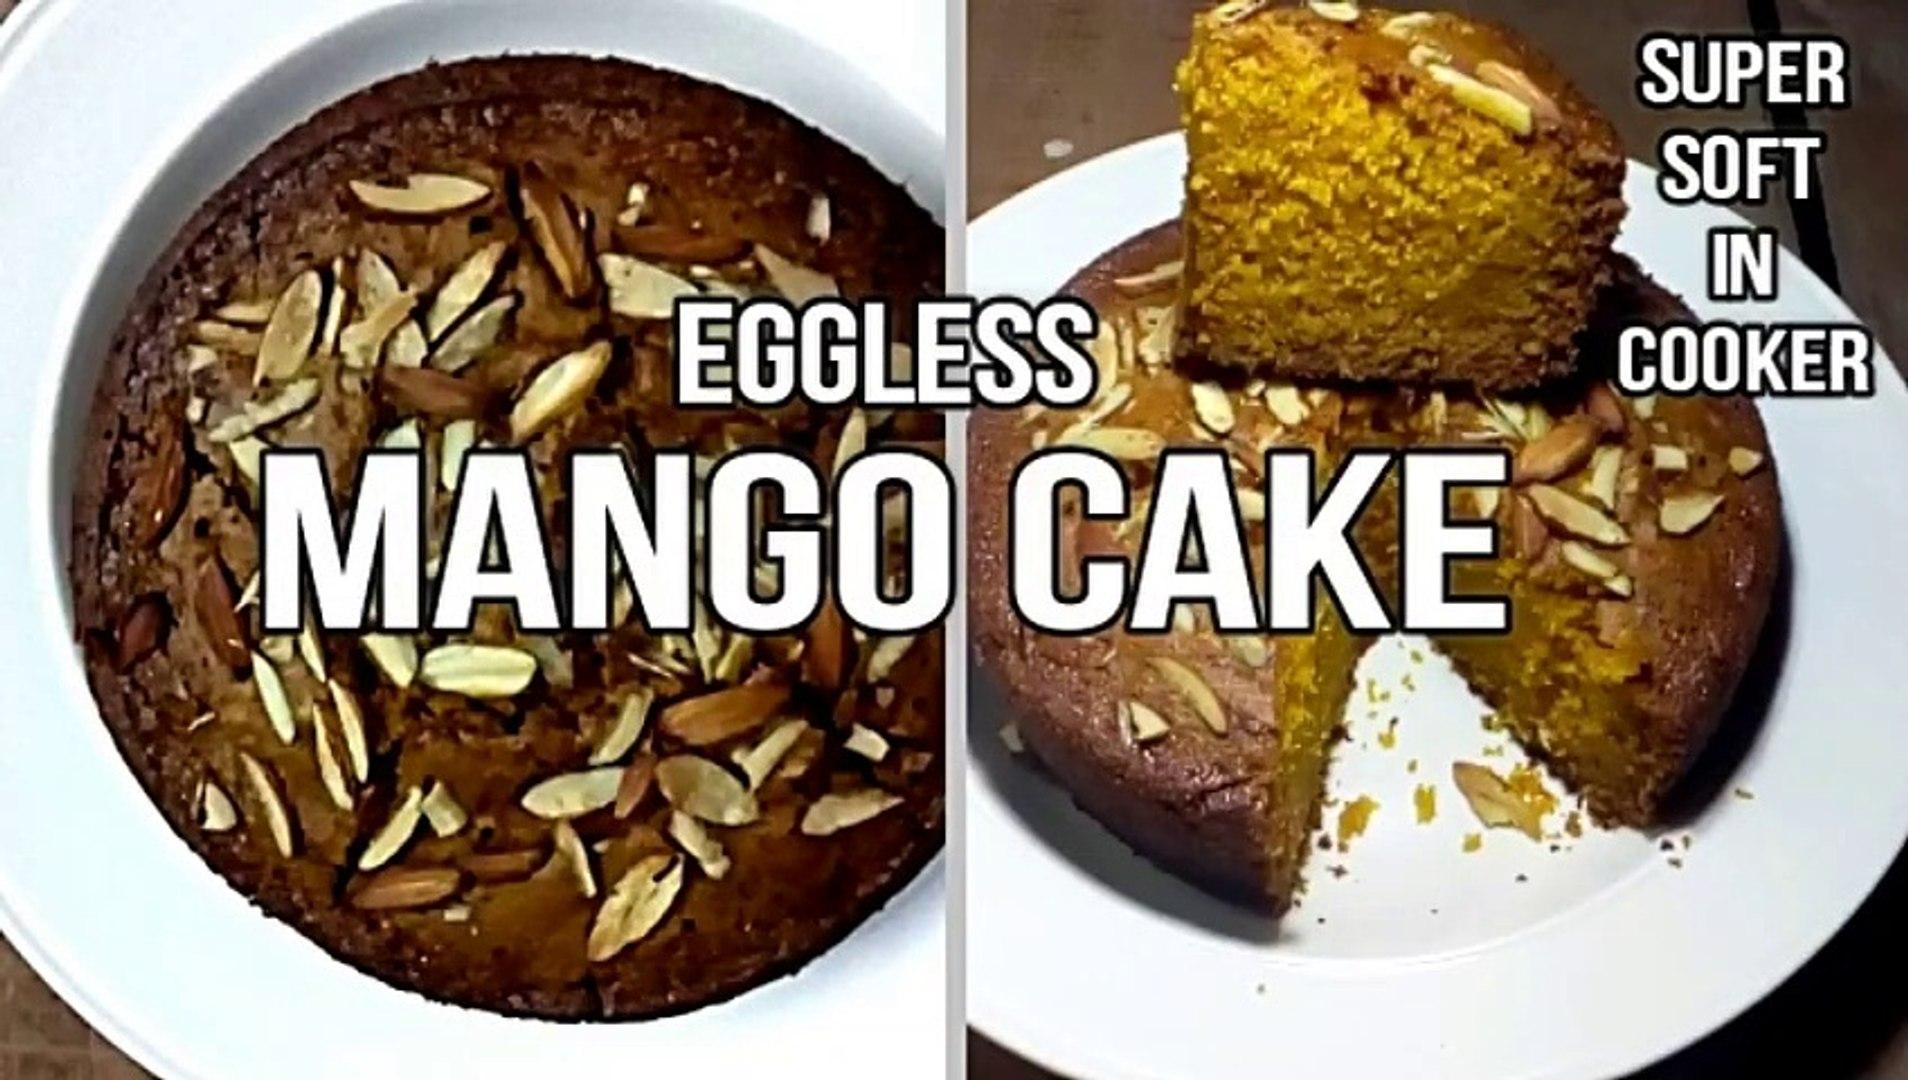 MANGO CAKE RECIPE, EGGLESS MANGO CAKE, MANGO CAKE IN COOKER, MANGO RAVA / SUJI CAKE